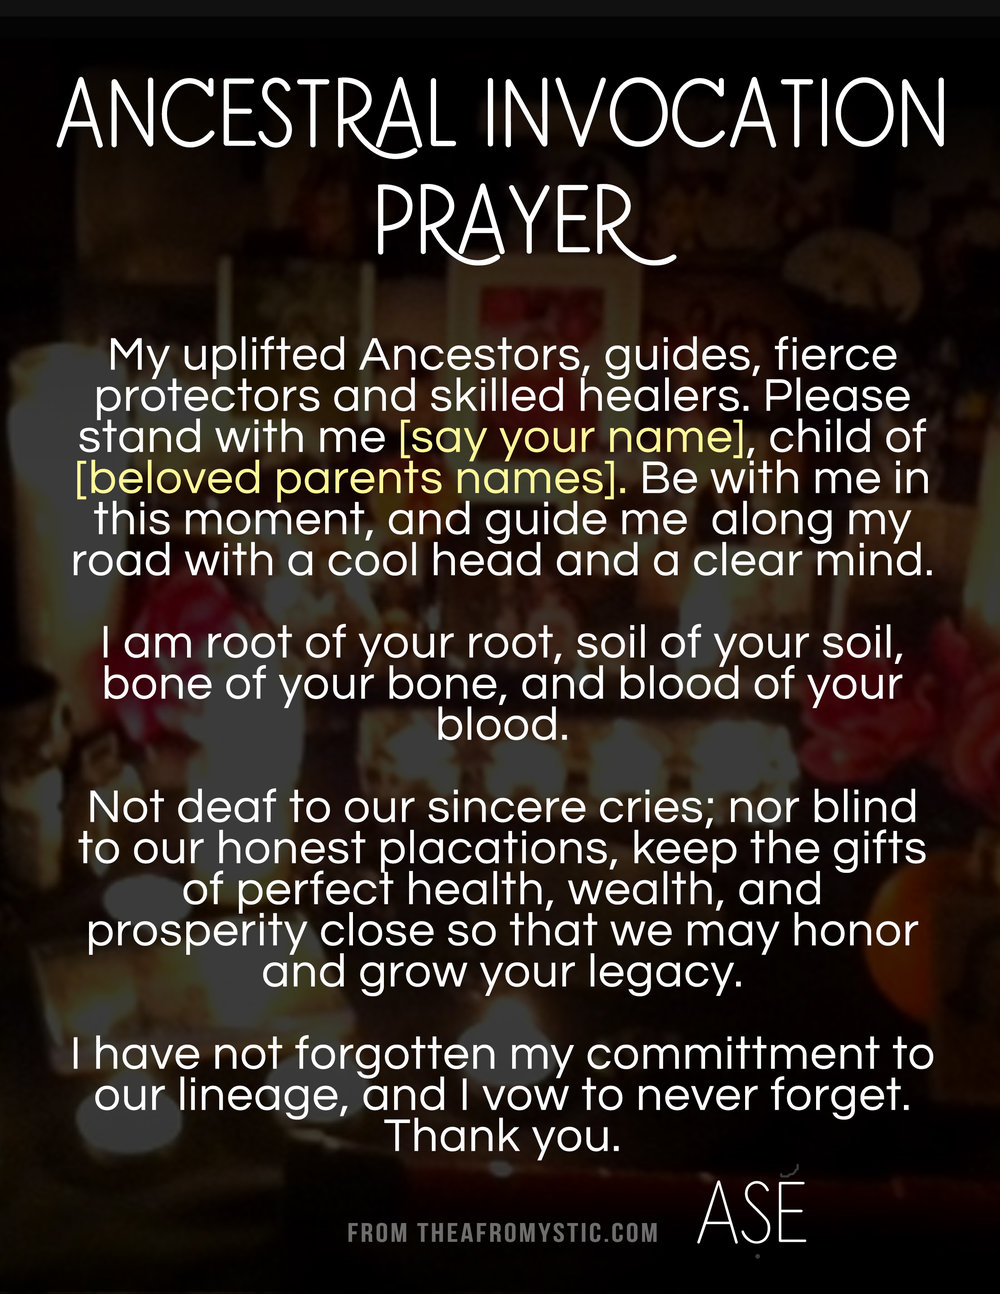 Ancestral Invocation Prayer.jpg